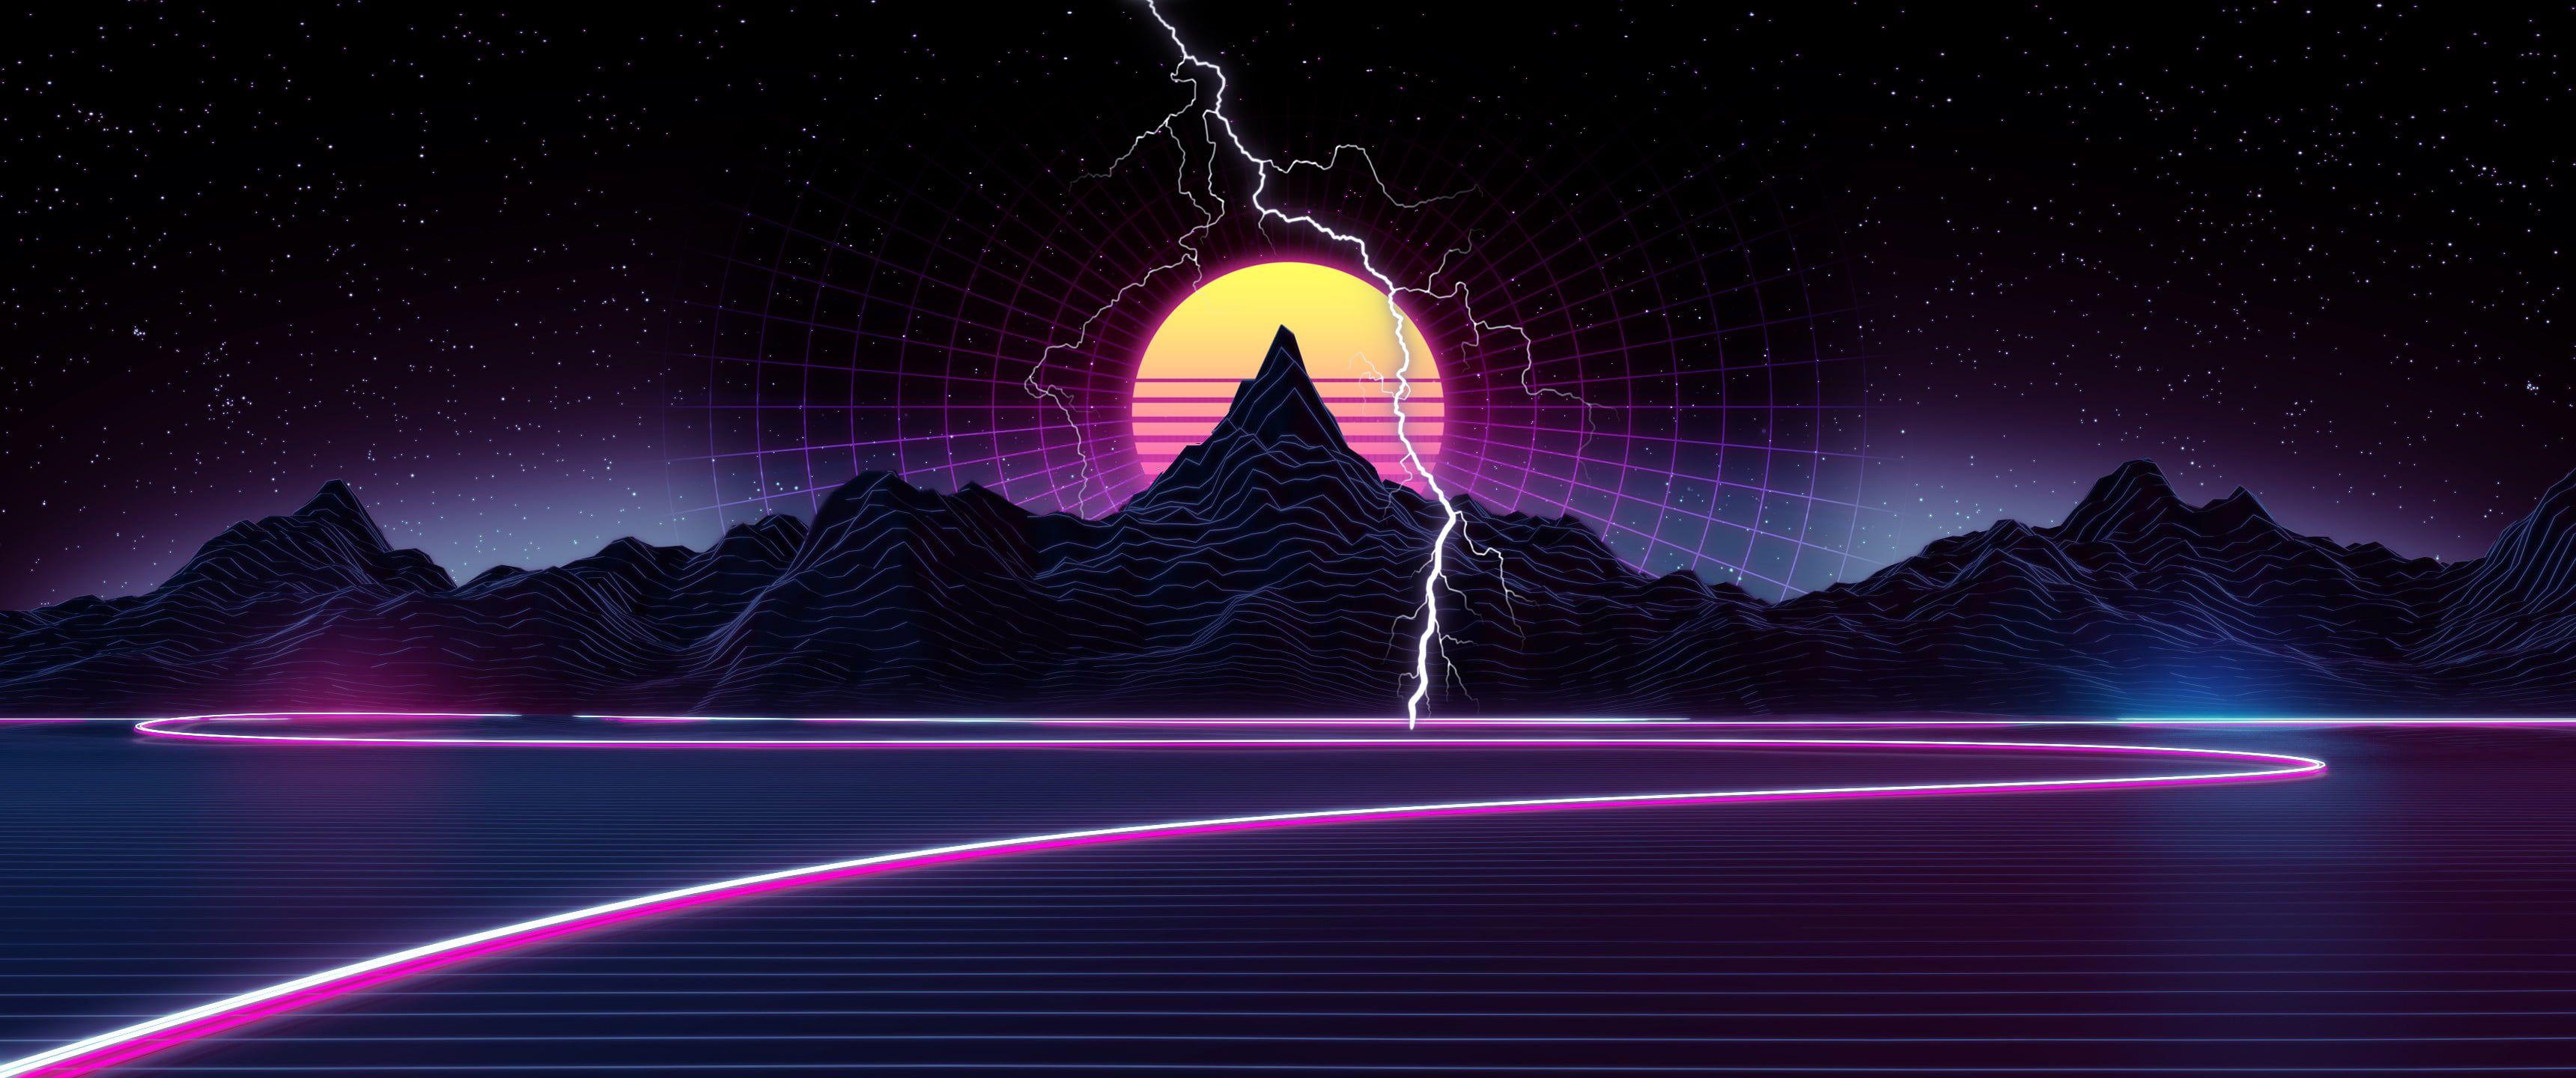 Download Retro Wave Wallpaper  Images